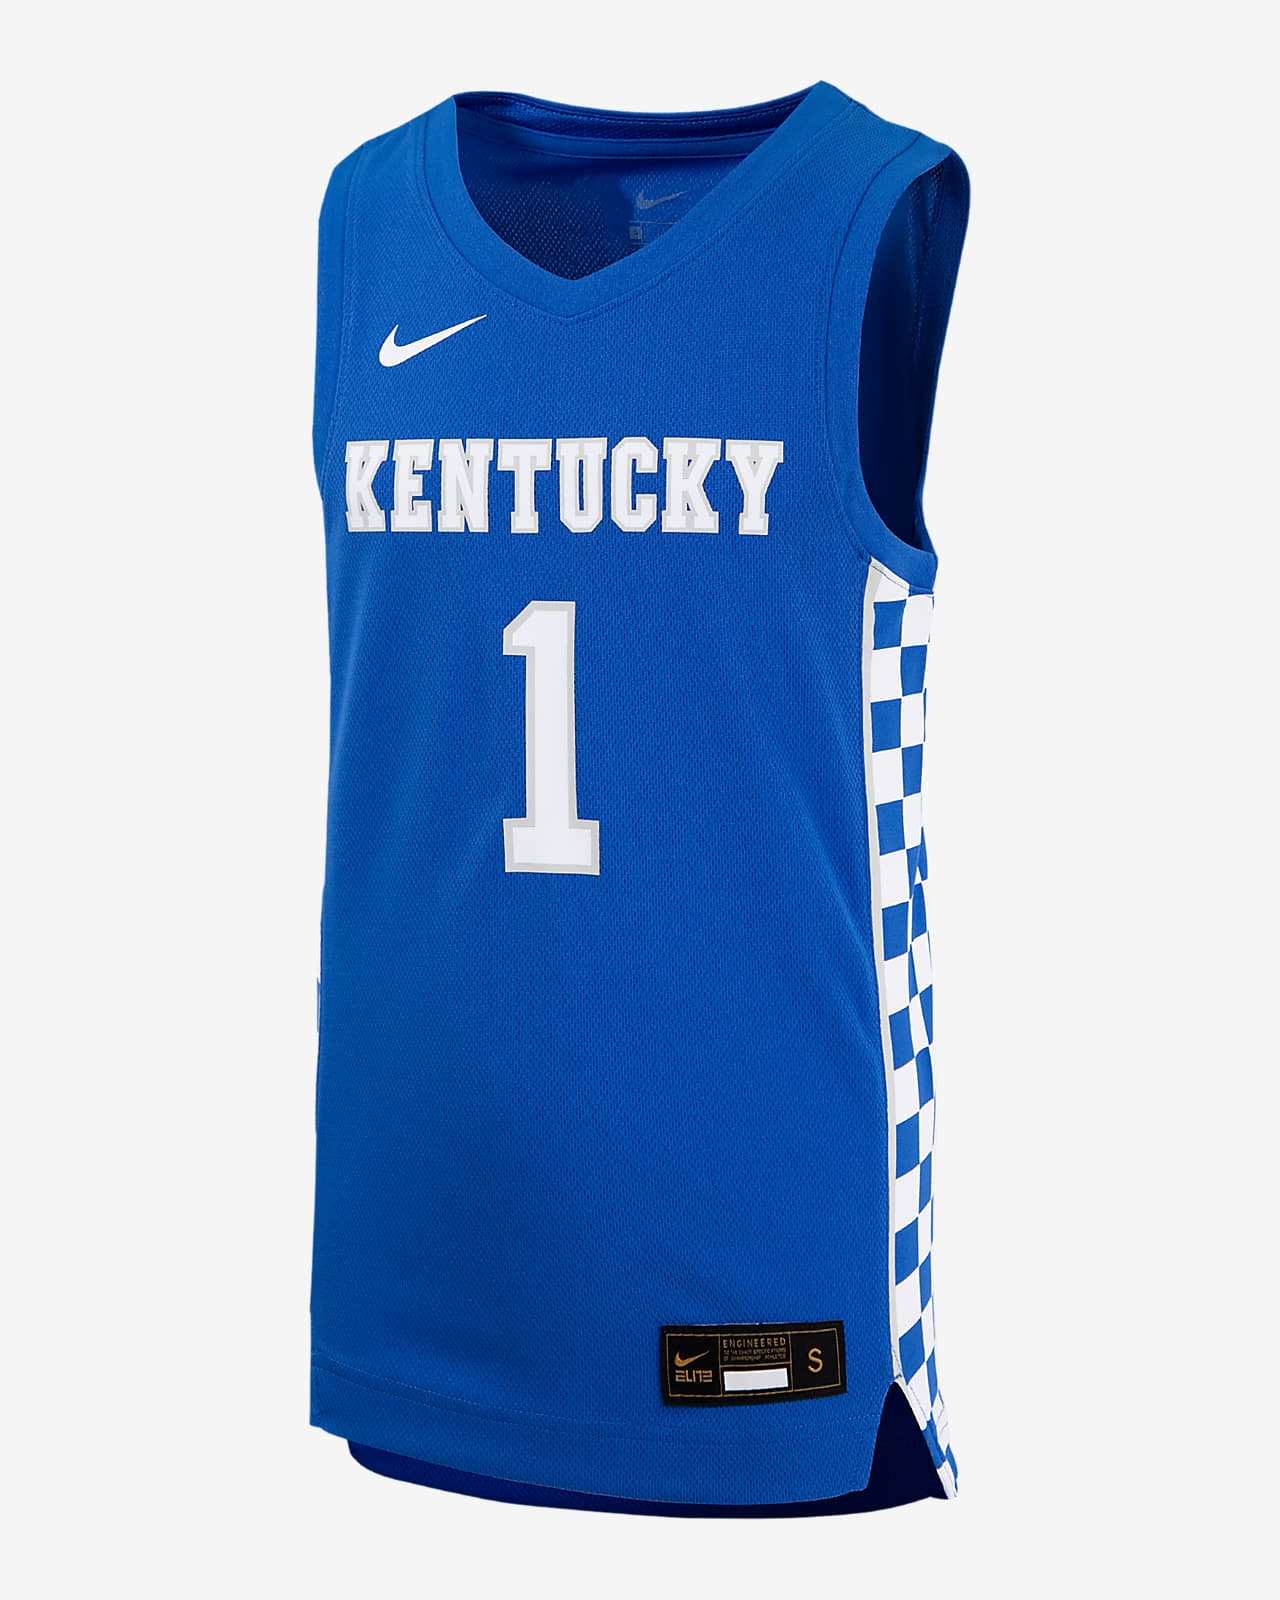 Nike College (Kentucky) Big Kids' Basketball Jersey